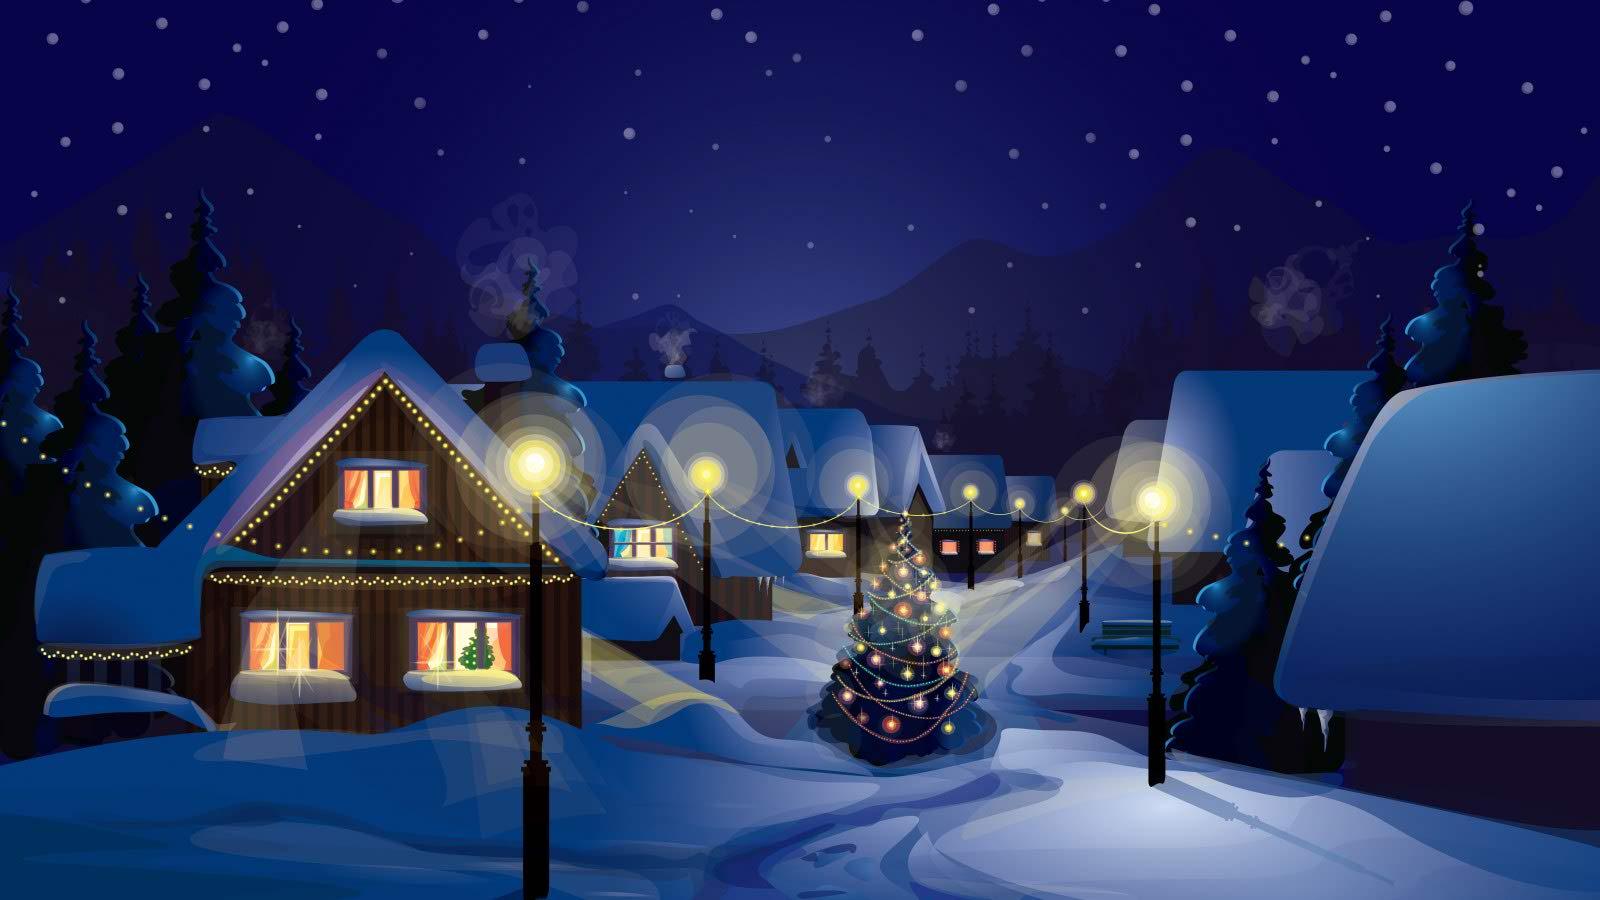 Download Wallpaper High Resolution Winter - christmas-wallpaper-high-resolution-30  2018_39368.jpg